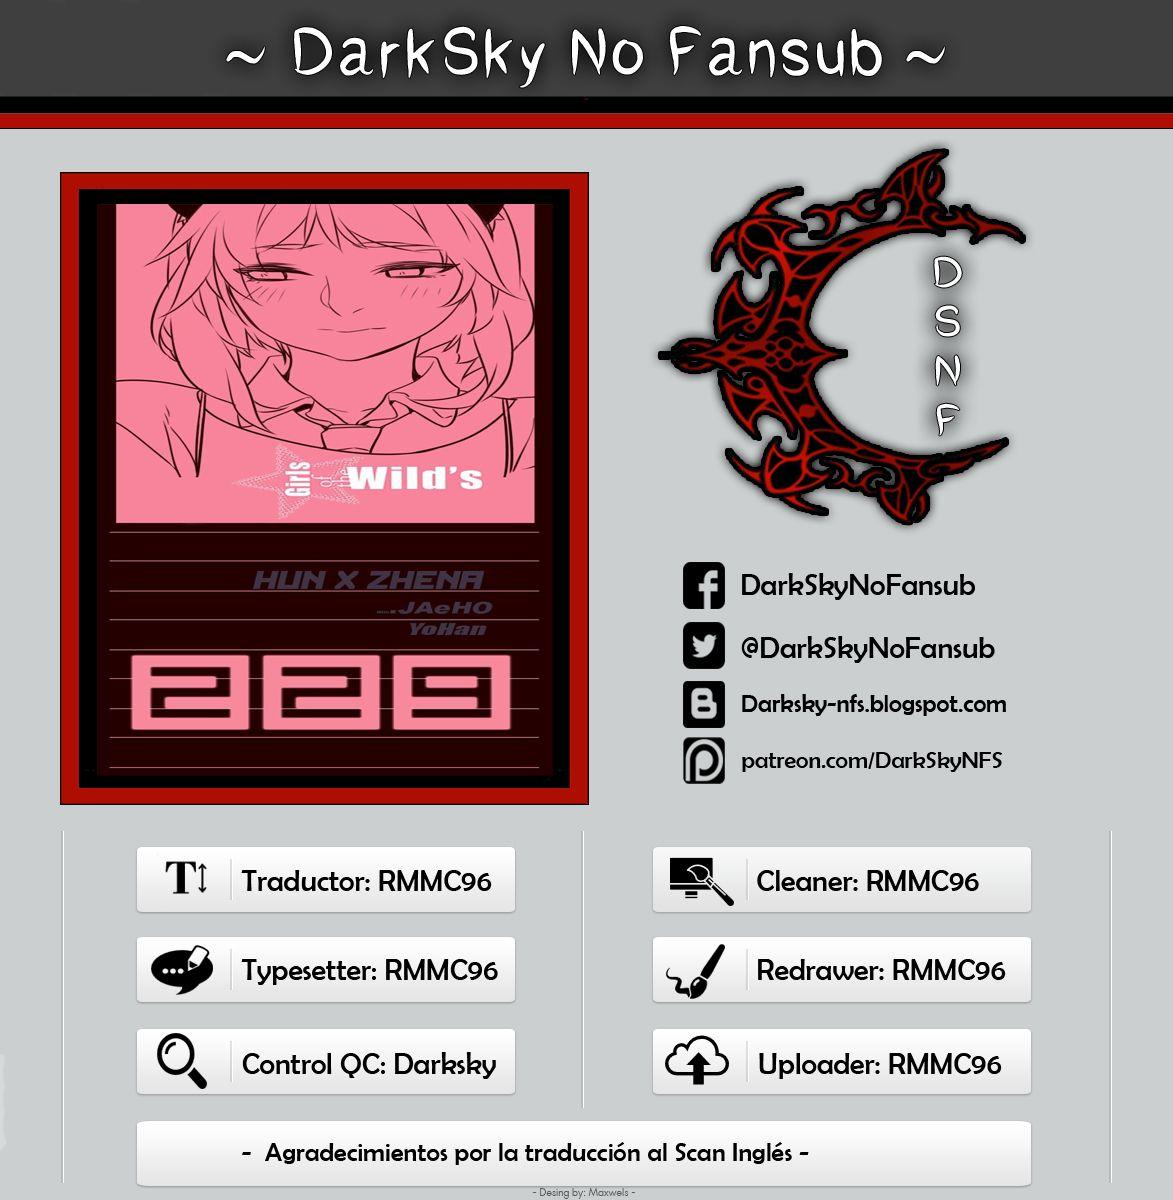 http://c5.ninemanga.com/es_manga/32/416/453465/8e1b6031314d35dffa354563befb9f70.jpg Page 1